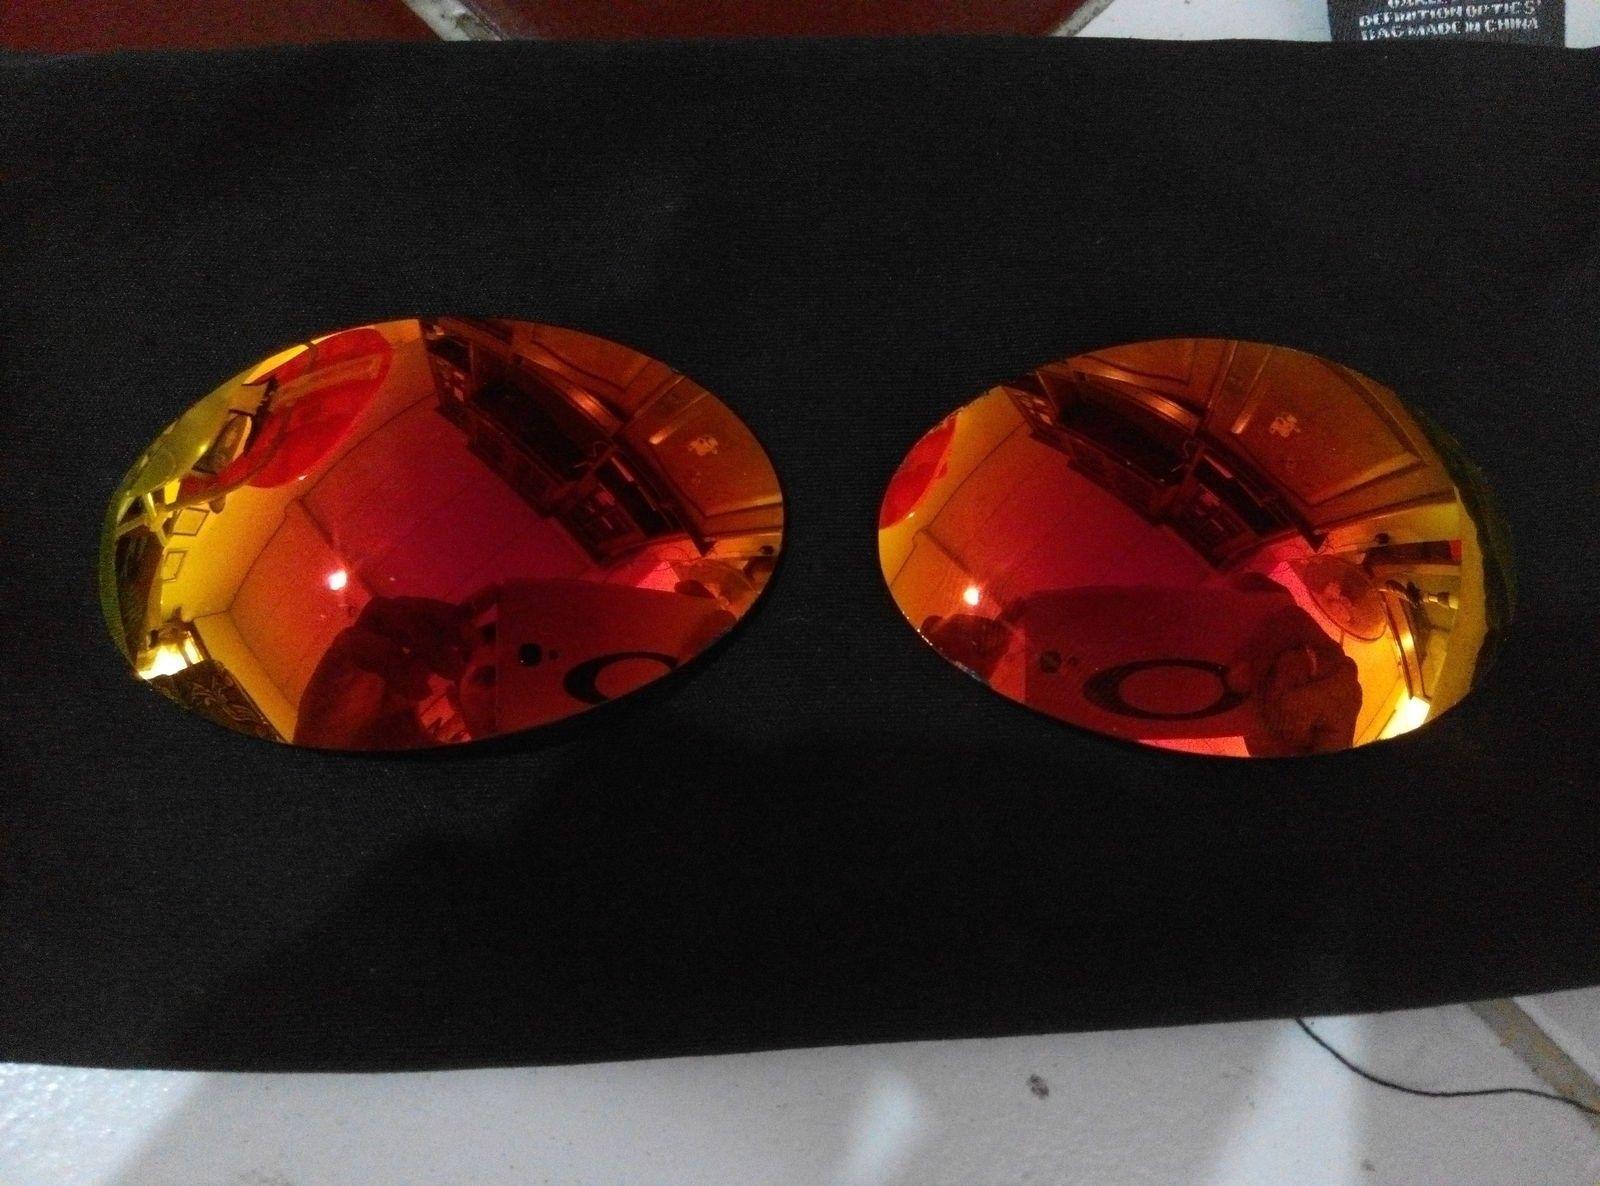 Ruby iridium oem cut for romeo 1 - IMG_20150628_150220.jpg